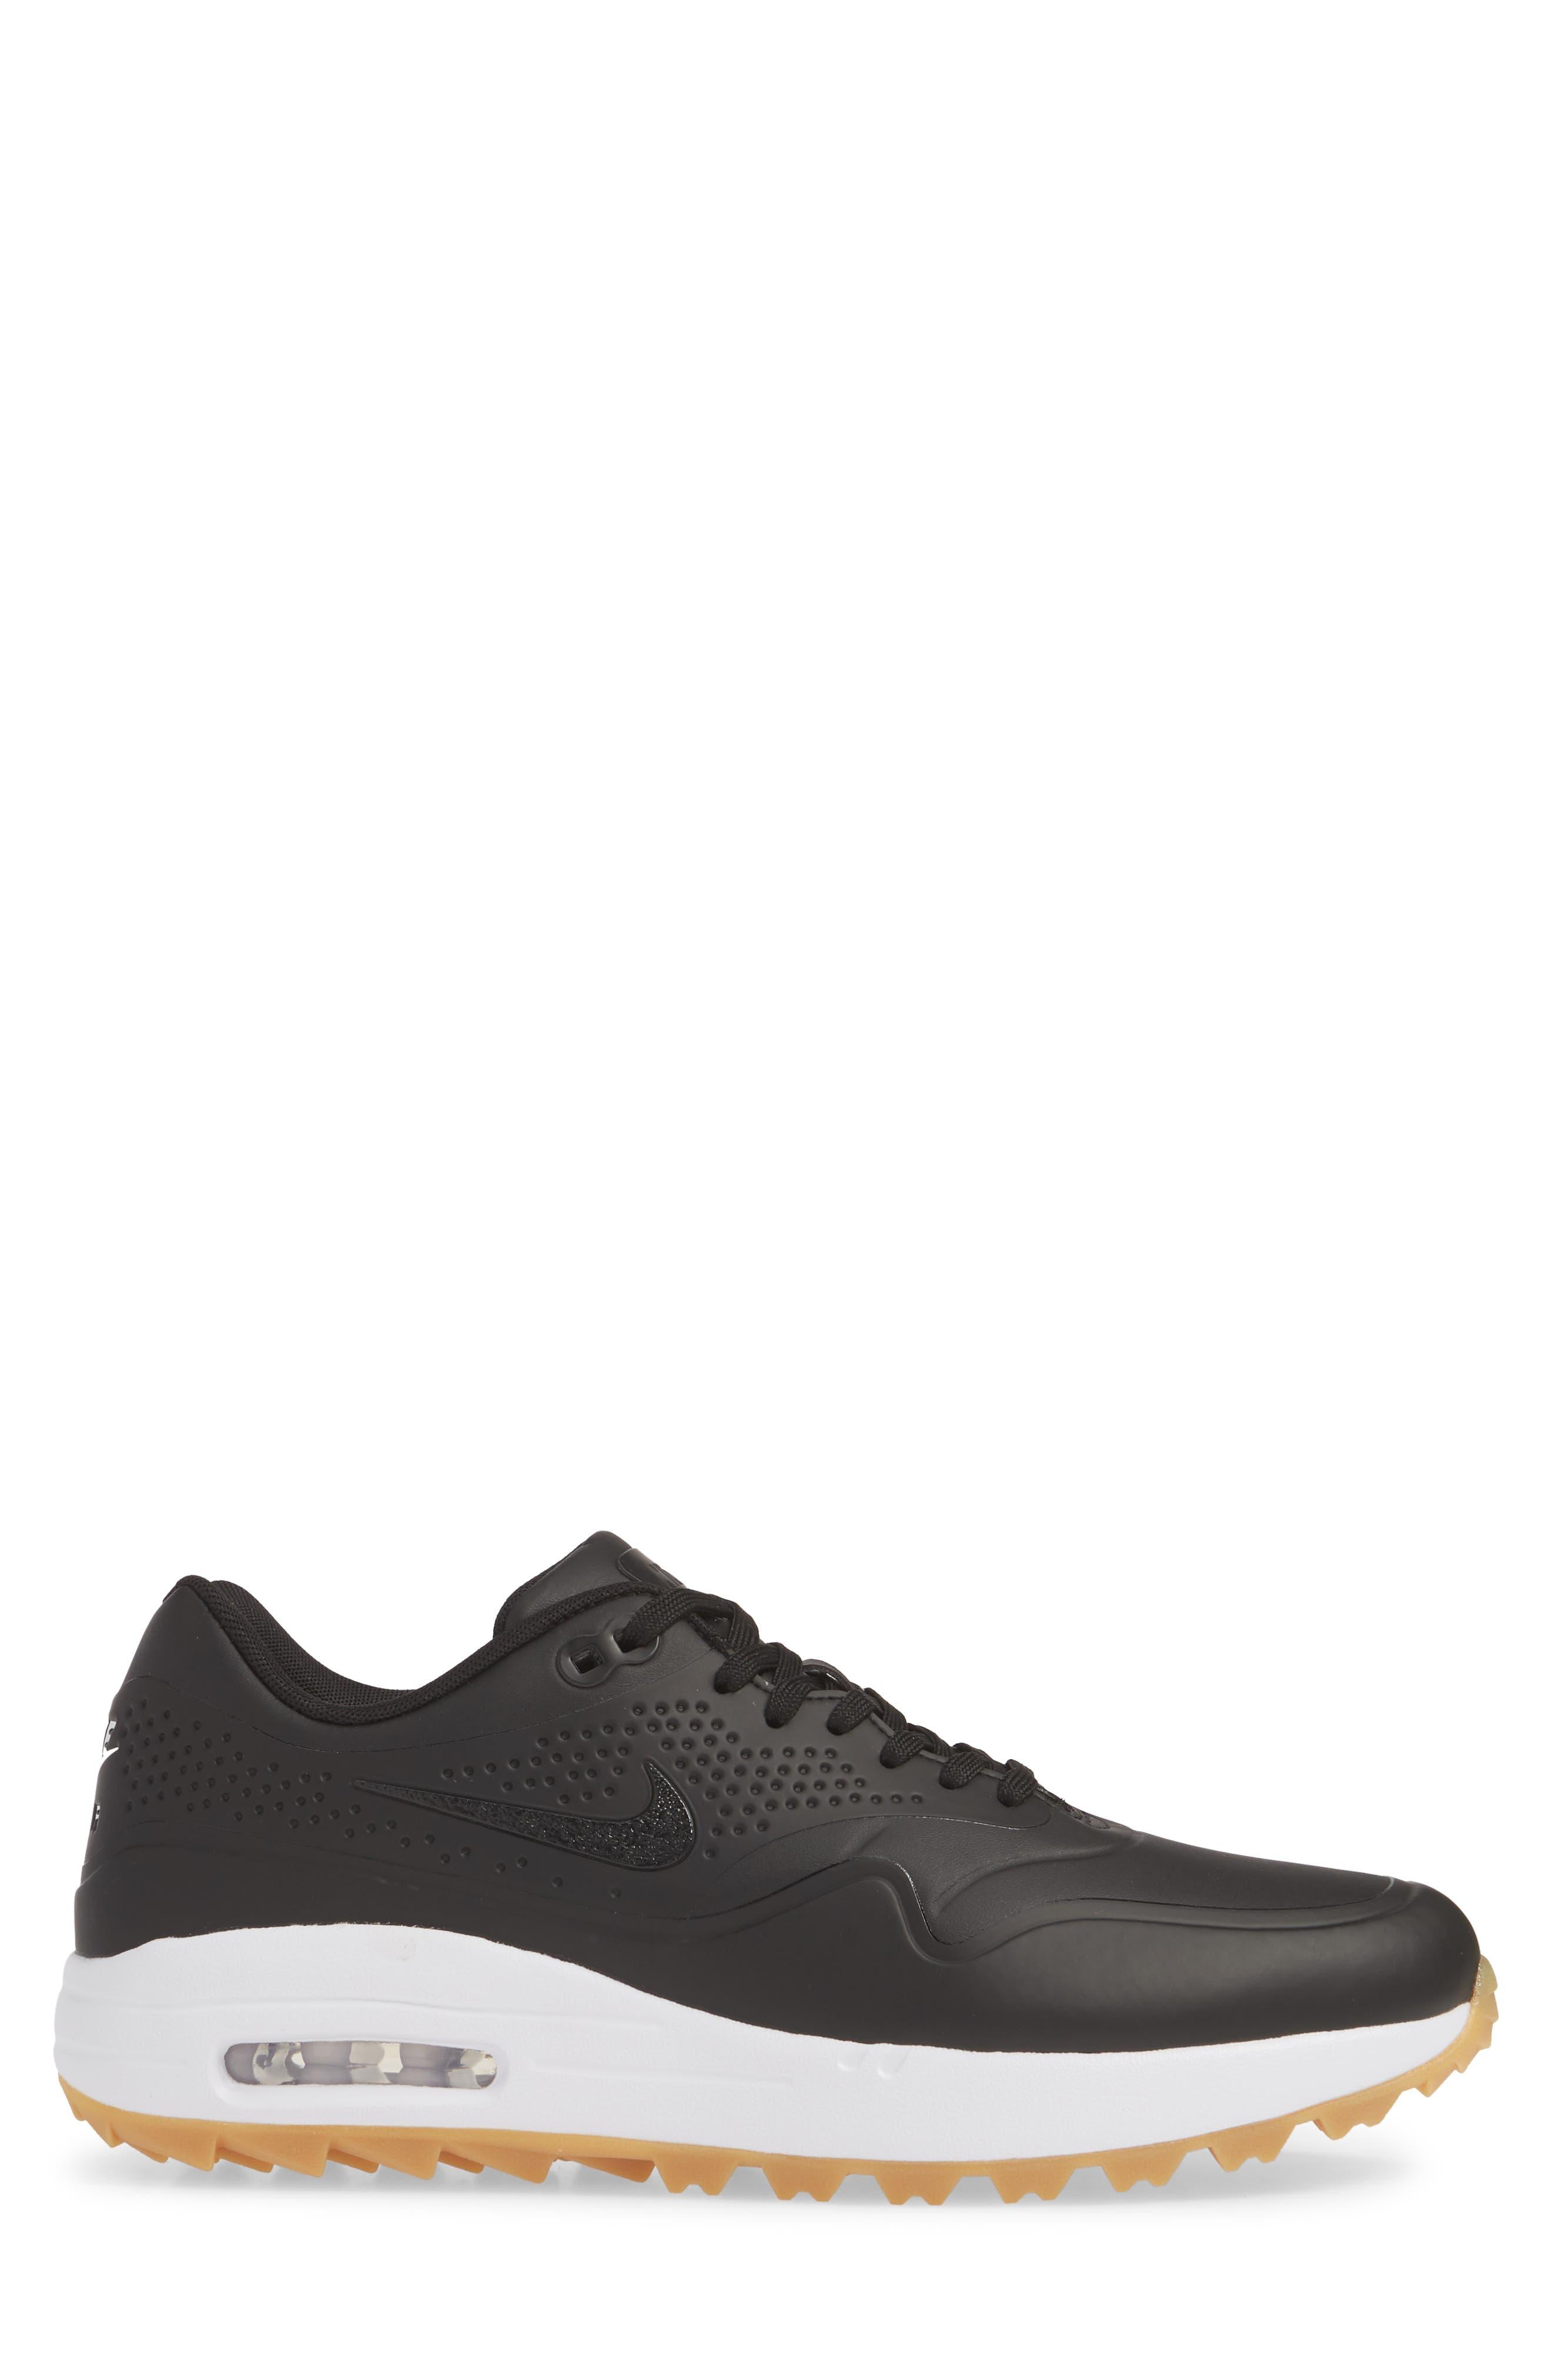 NIKE, Air Max 1 Golf Sneaker, Alternate thumbnail 3, color, BLACK/ GUM LIGHT BROWN